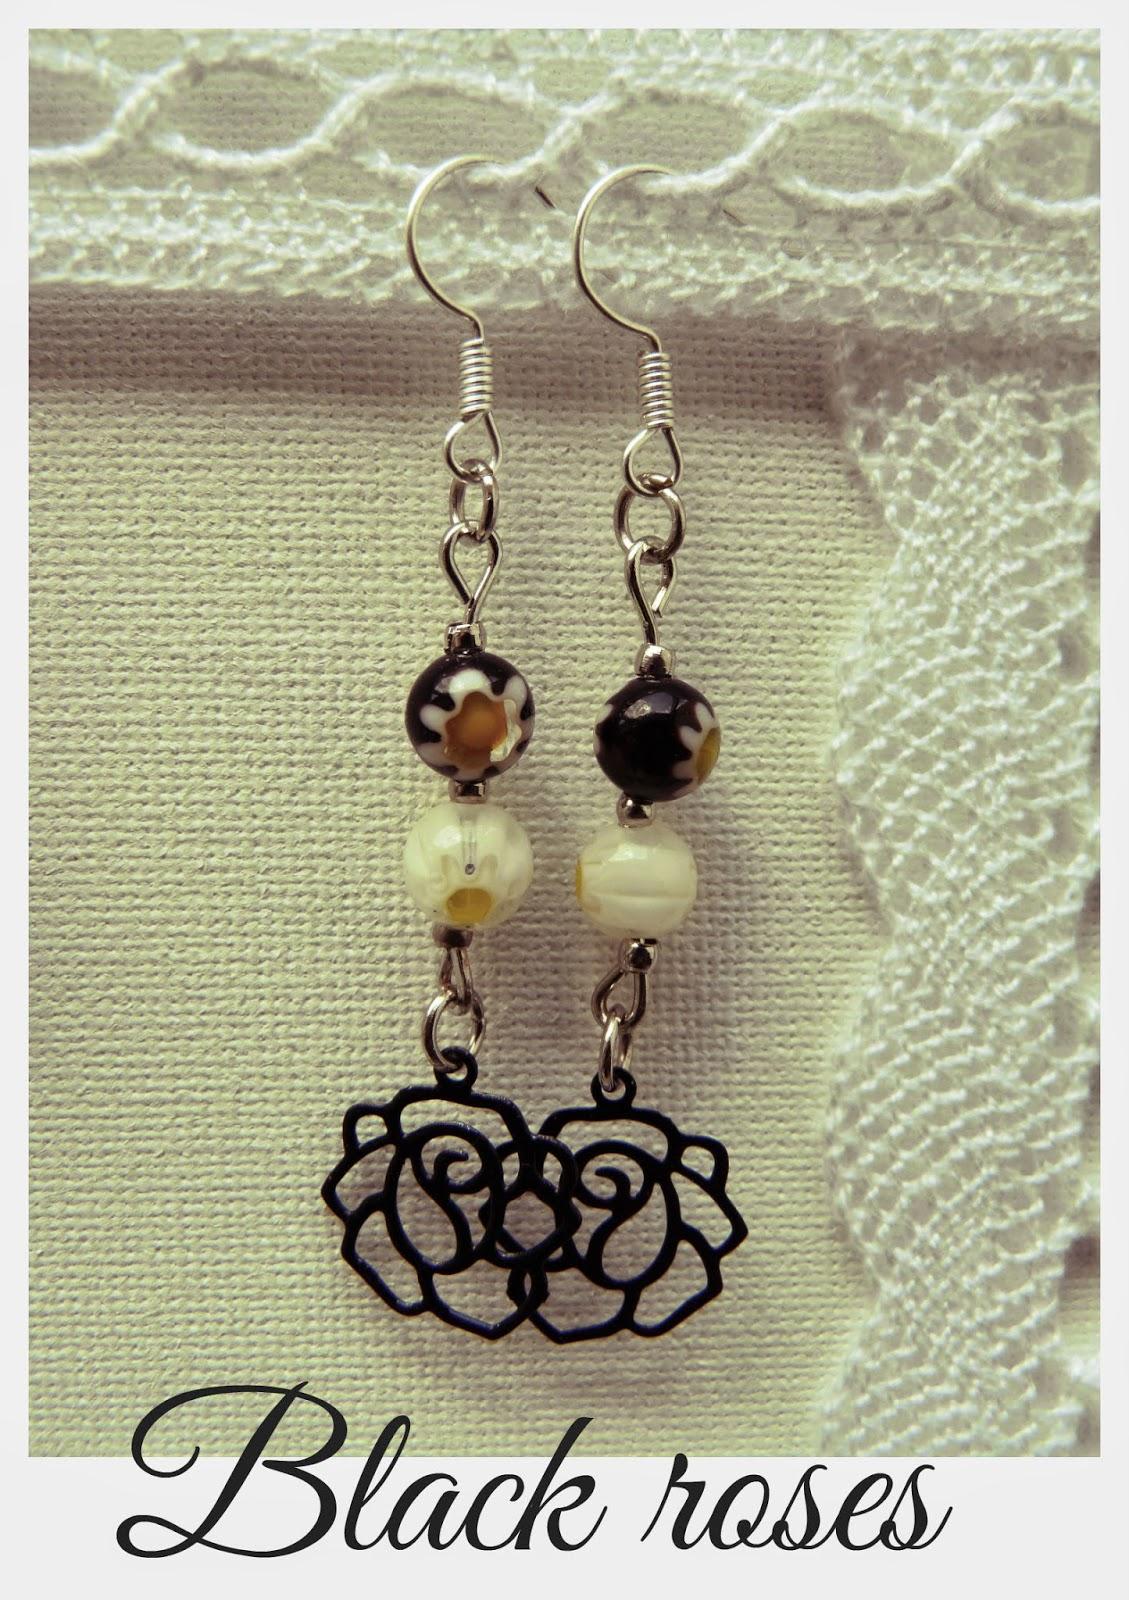 http://www.alittlemarket.com/boucles-d-oreille/fr_boucles_d_oreilles_ultra_romantique_black_roses_-9374689.html